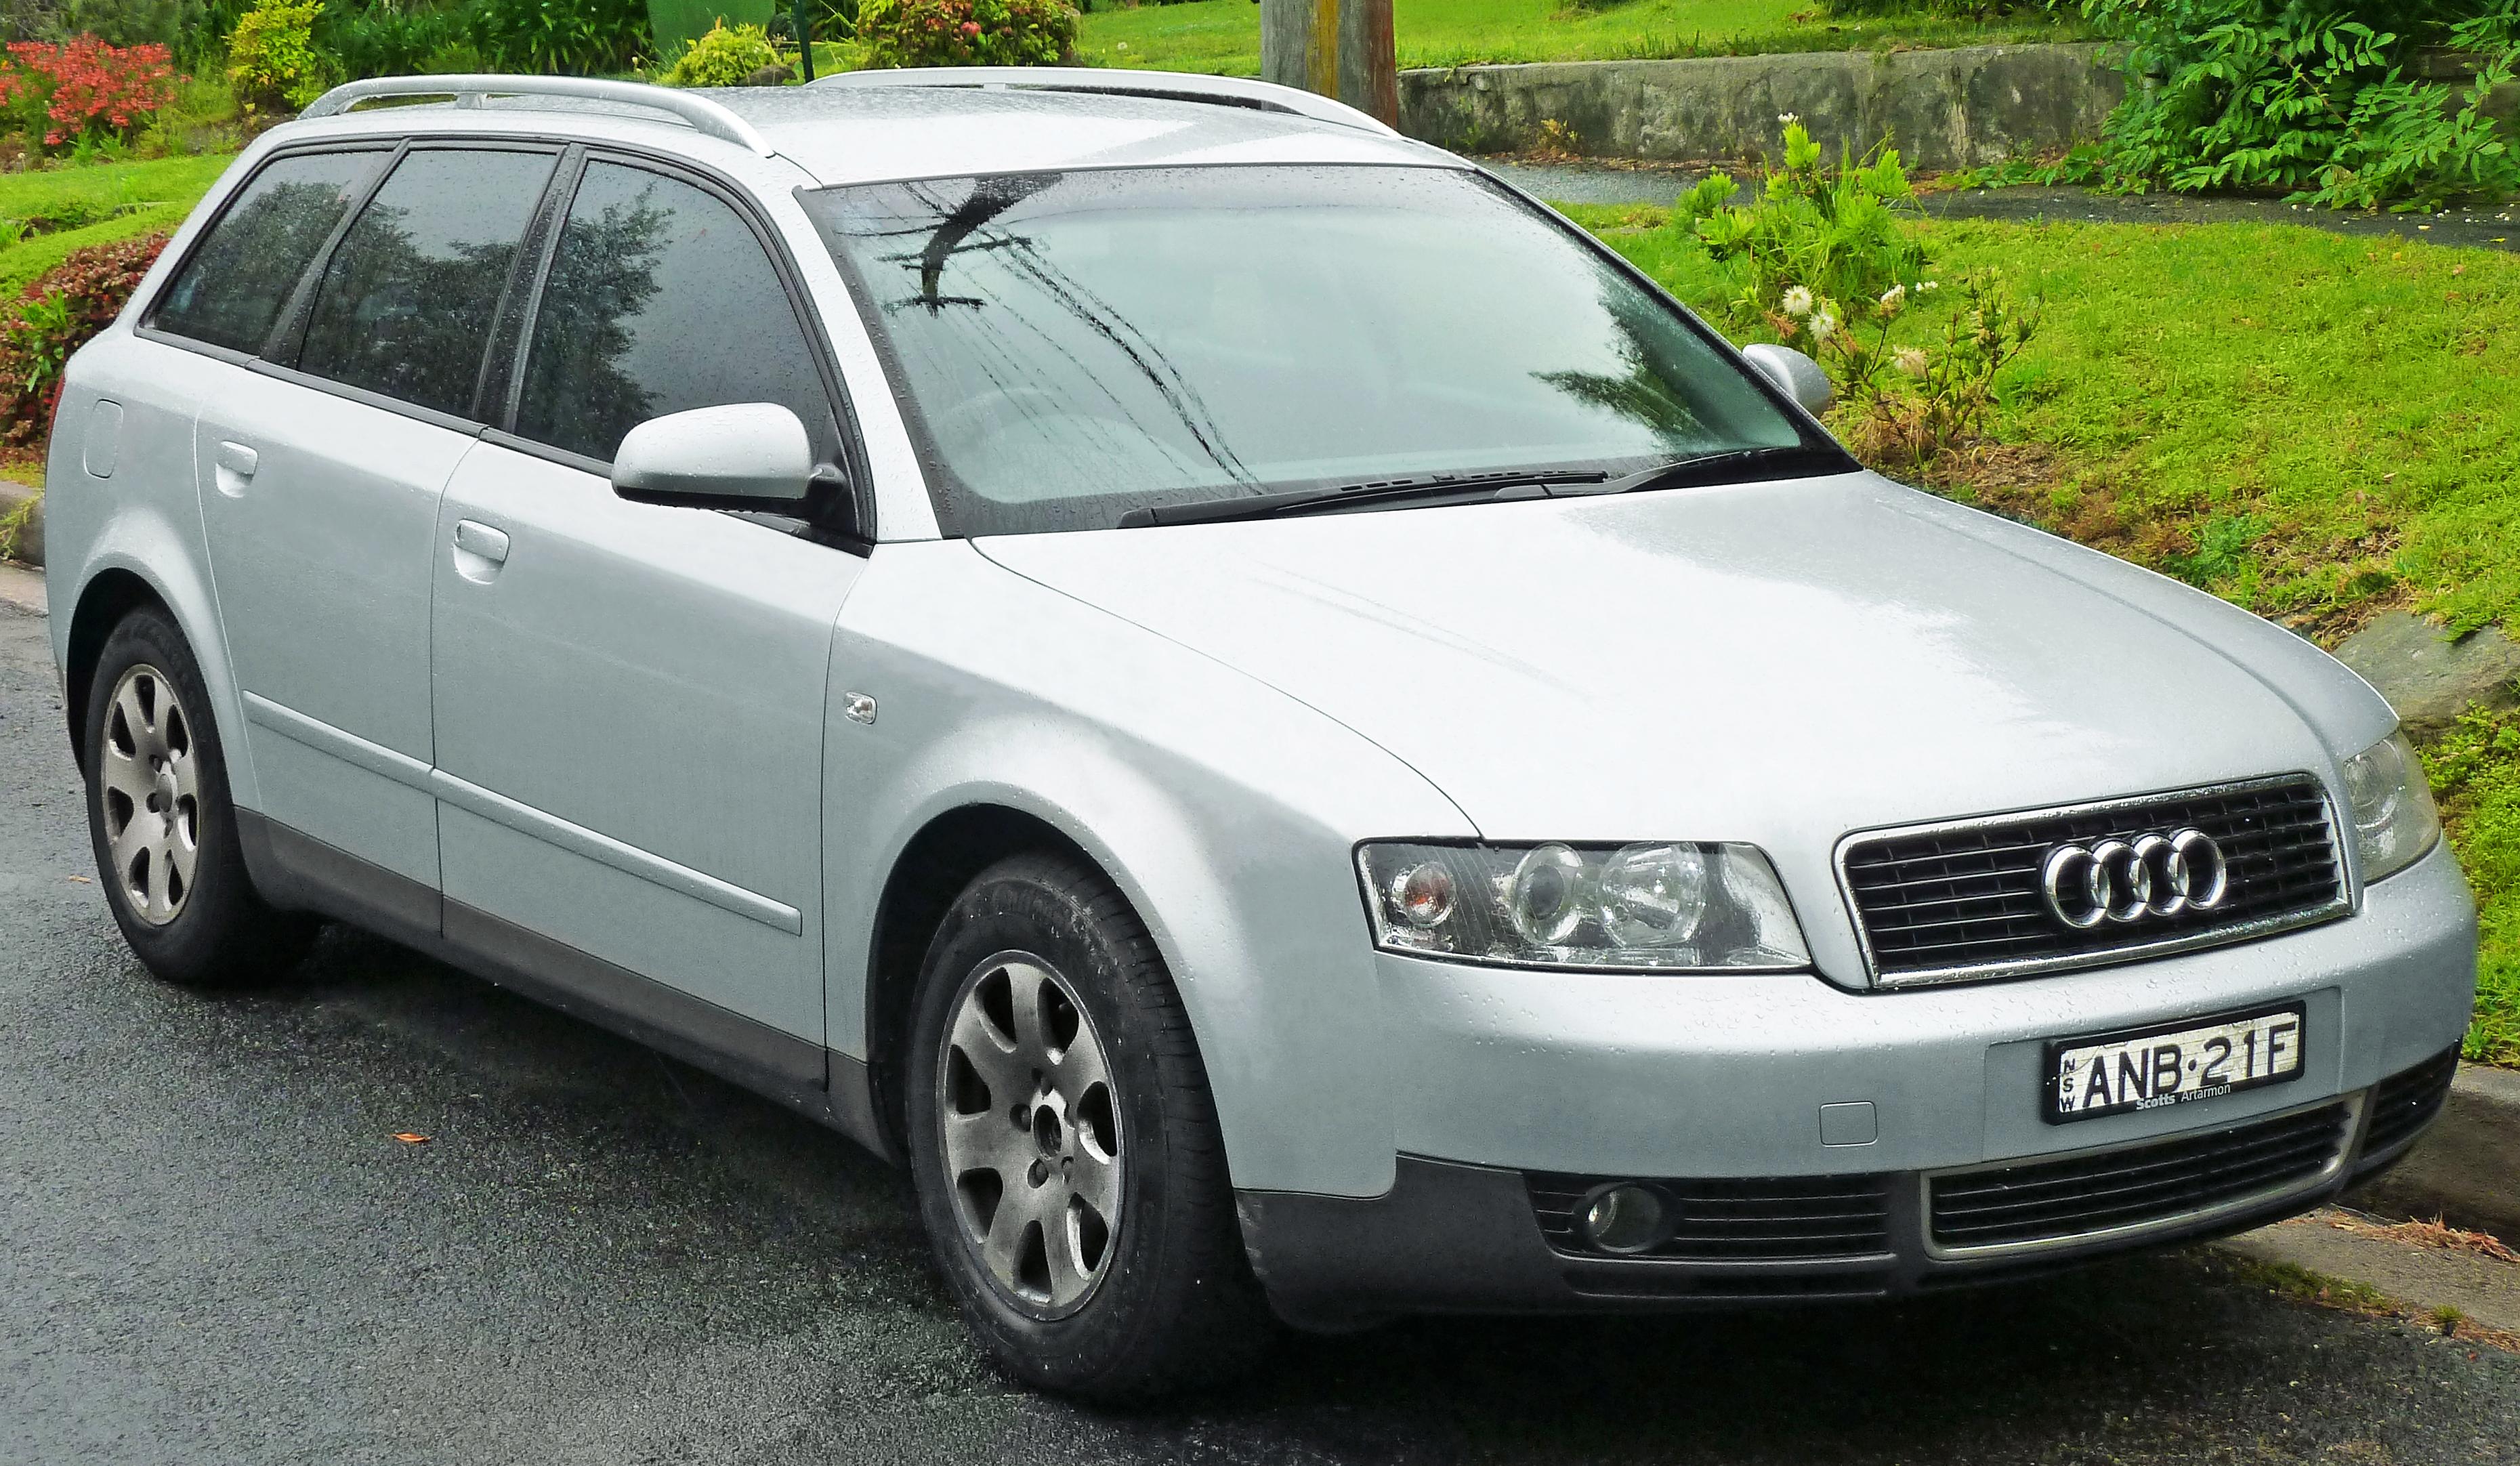 Description 2002-2005 Audi A4 (8E) 2.0 Avant (2011-10-25) 01.jpg